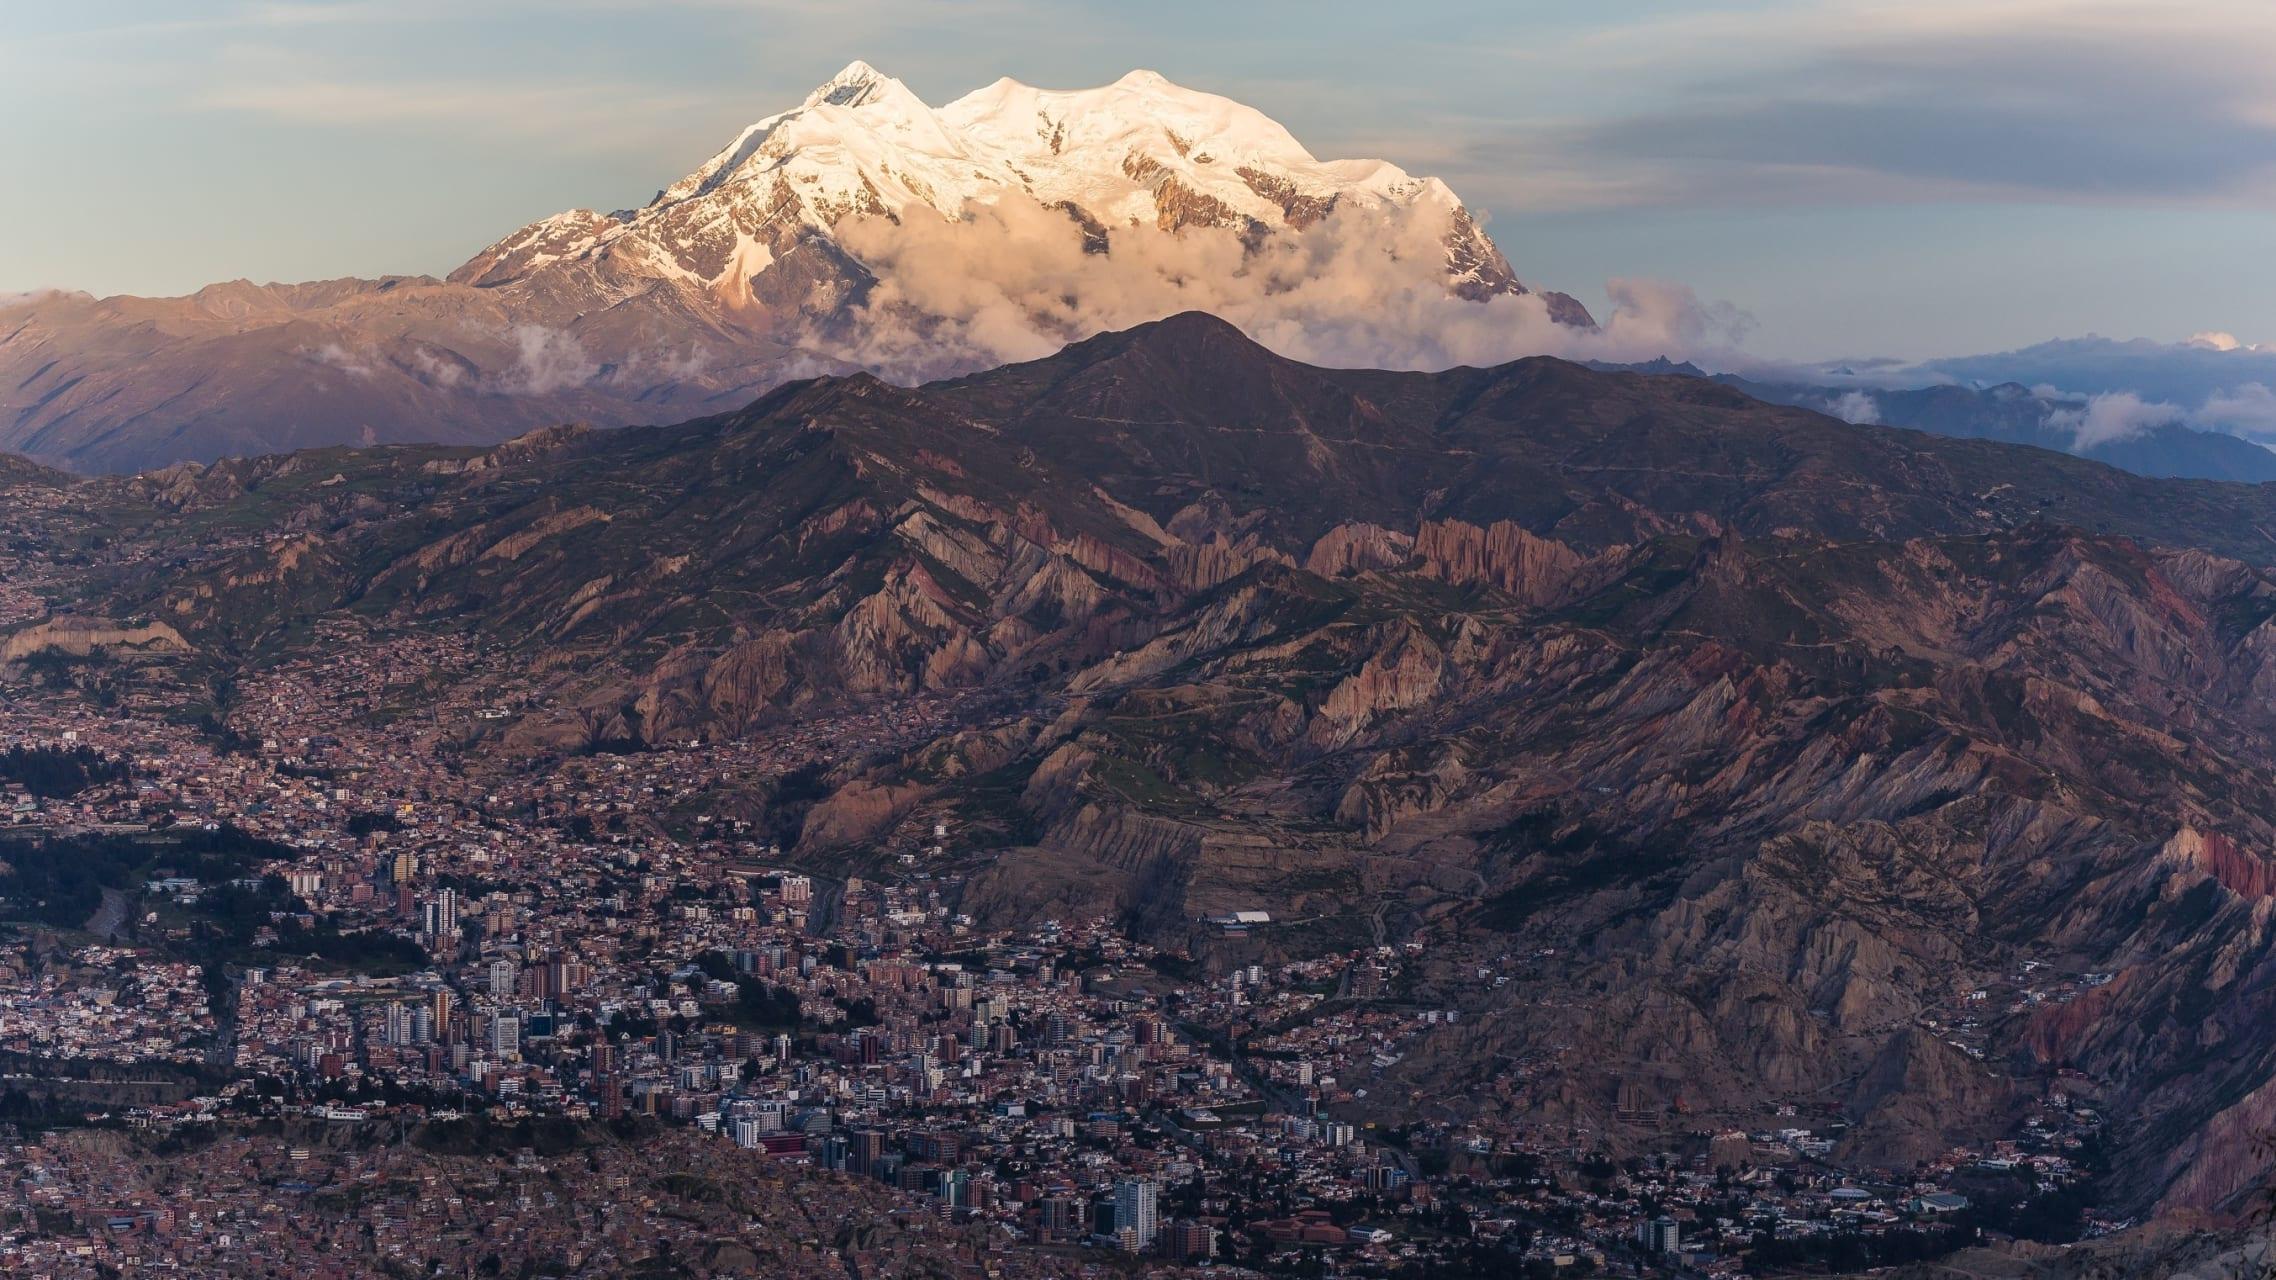 La Paz - The Andes